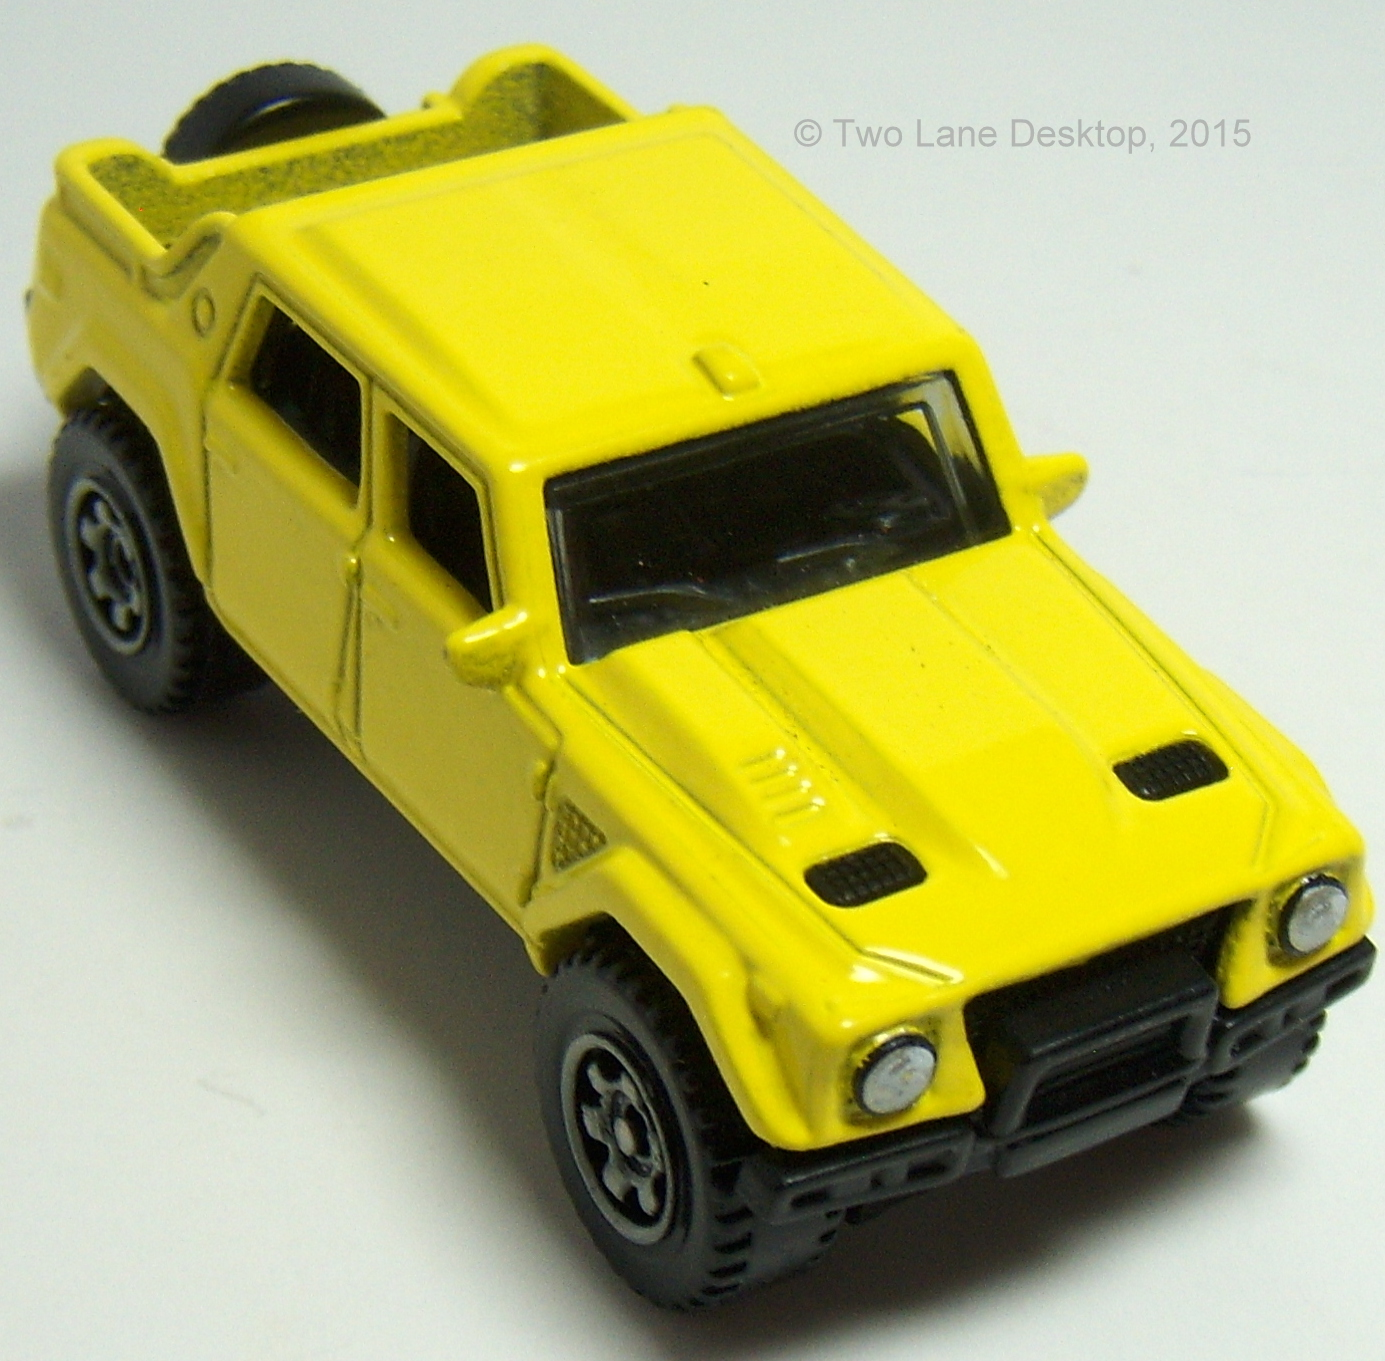 Two Lane Desktop Matchbox Lamborghini Lm002 And Hot